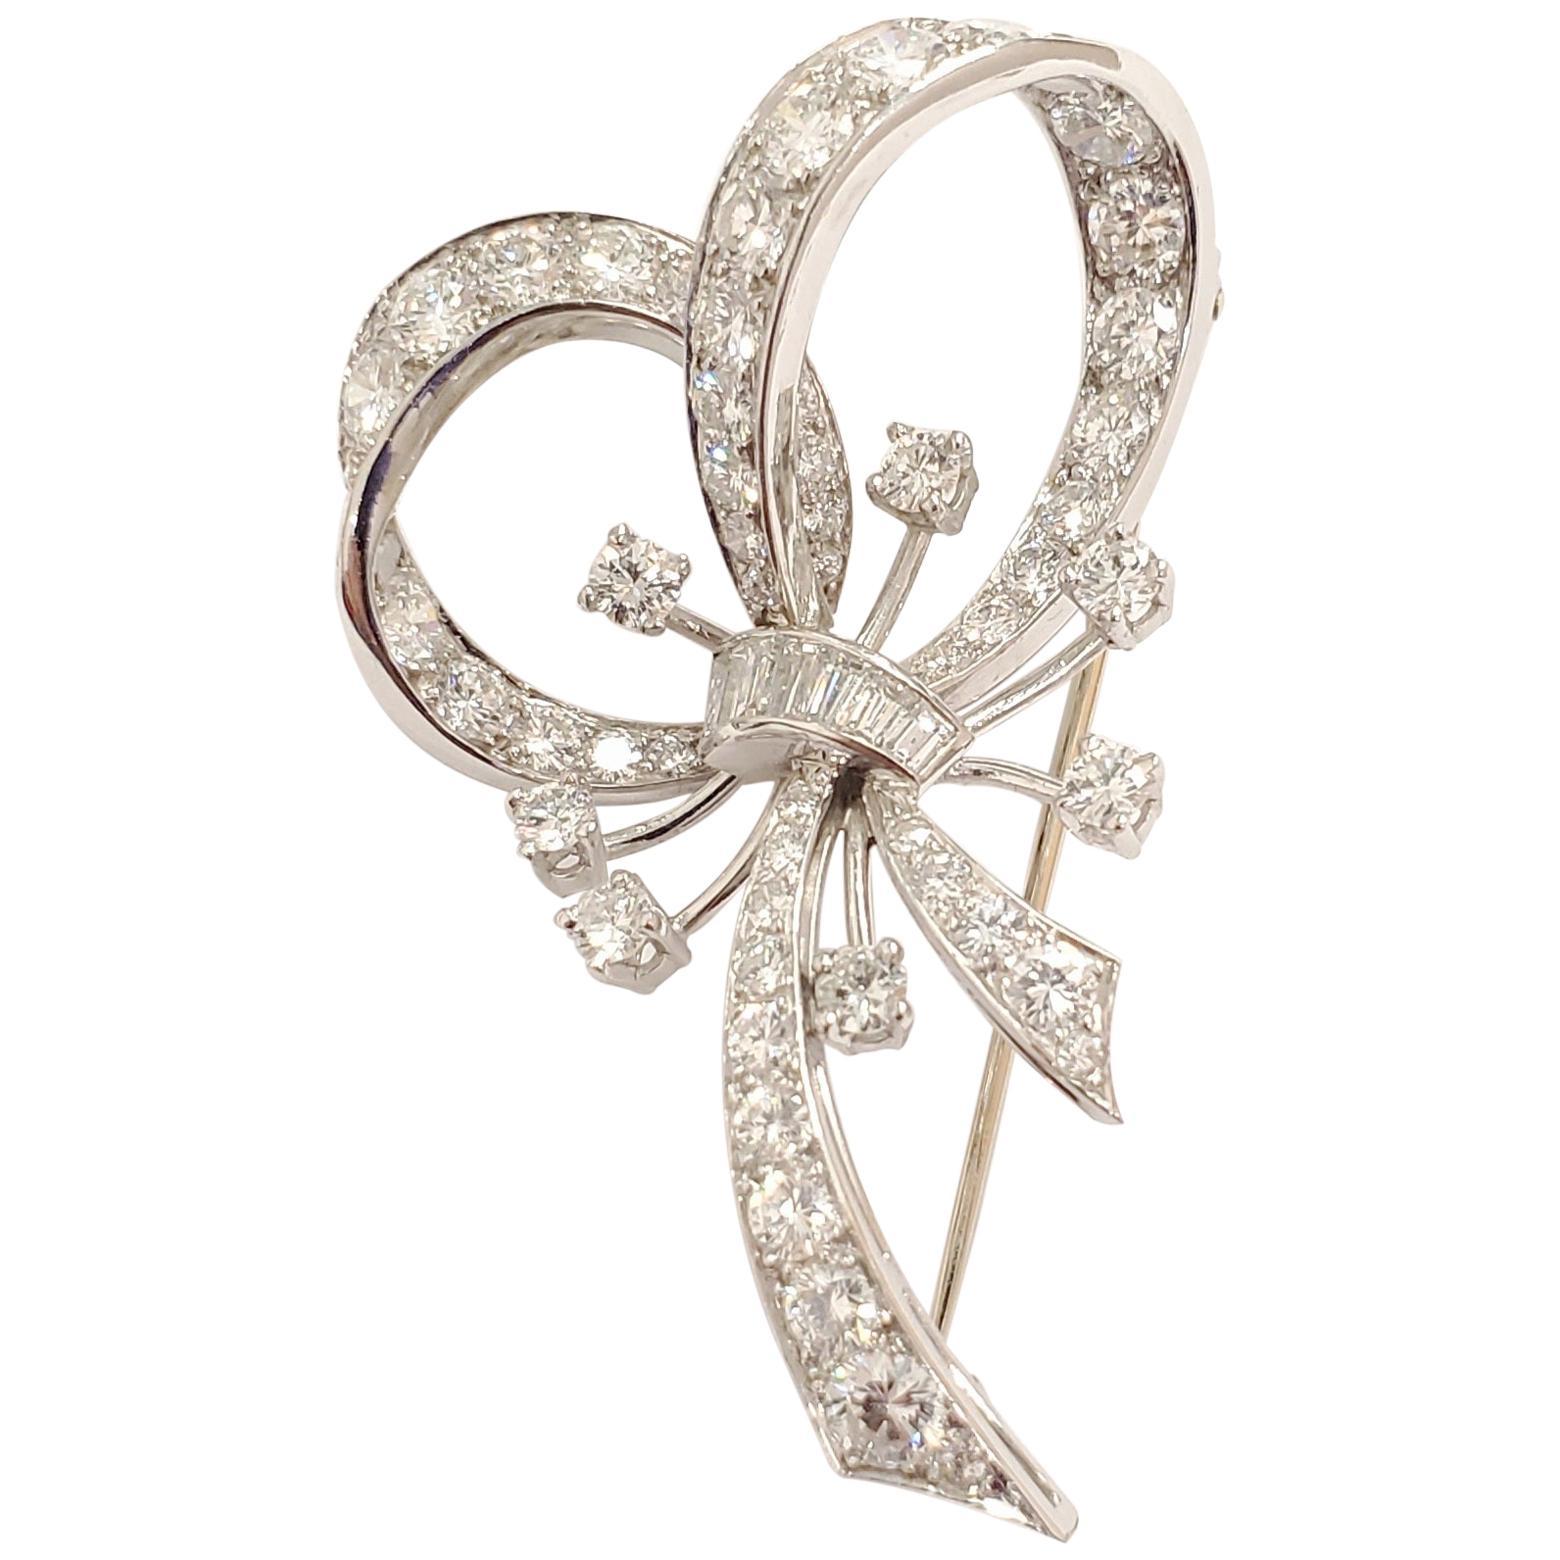 3.00 Carat Total Diamond Brooch in Platinum